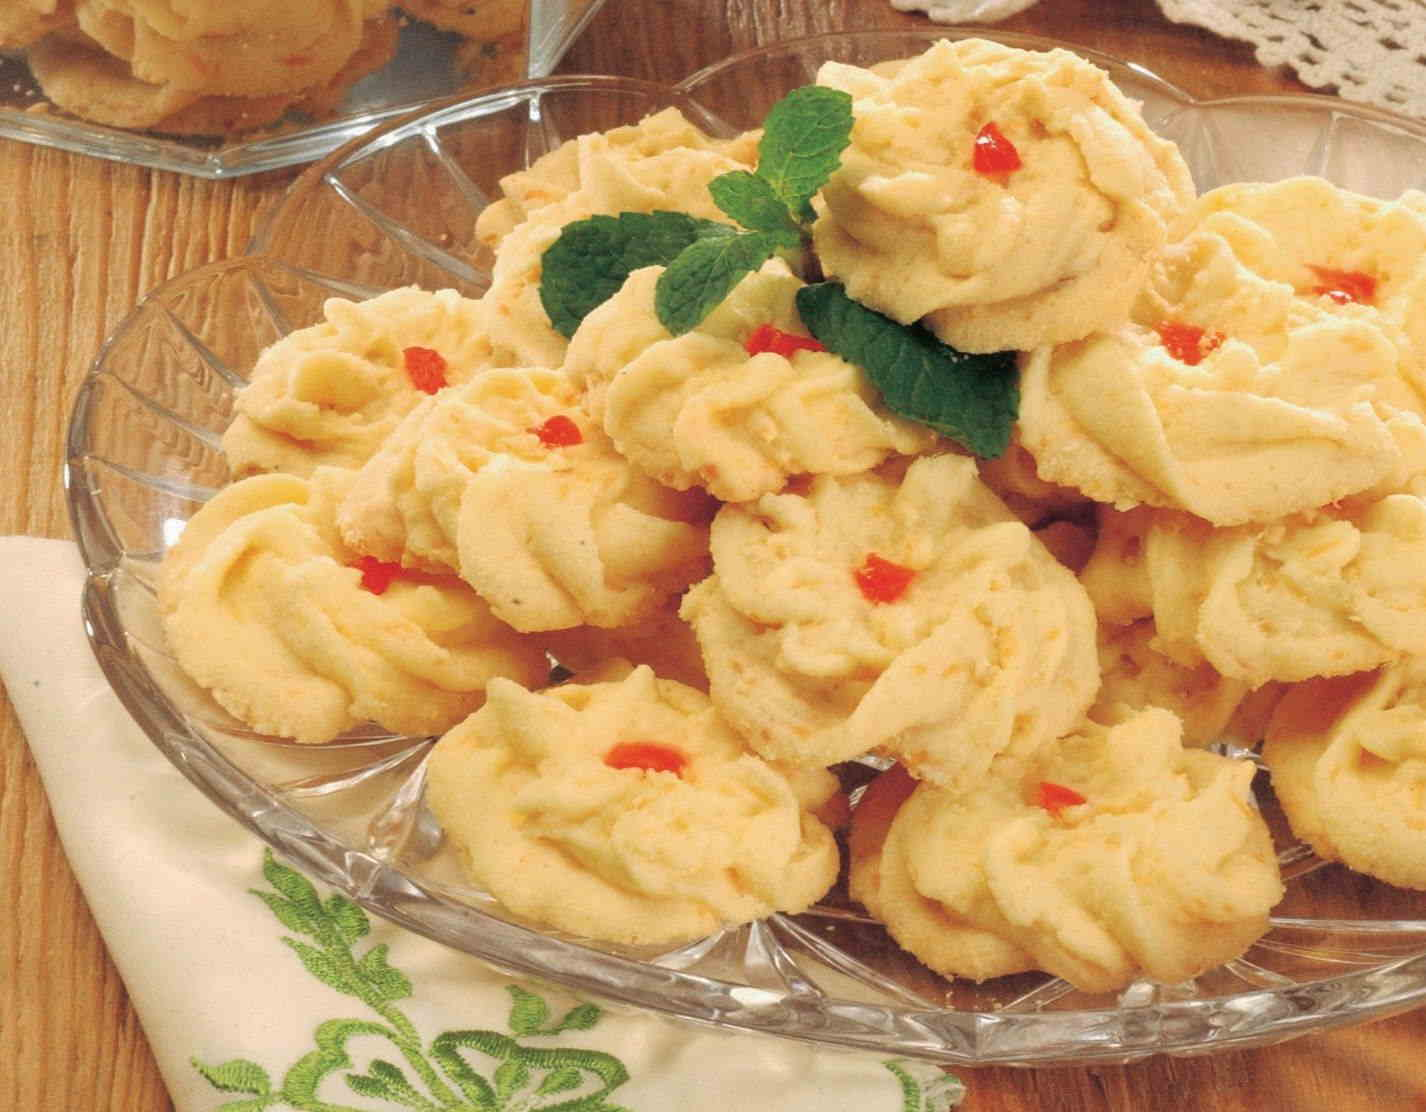 Kue Sagu Keju strawberry